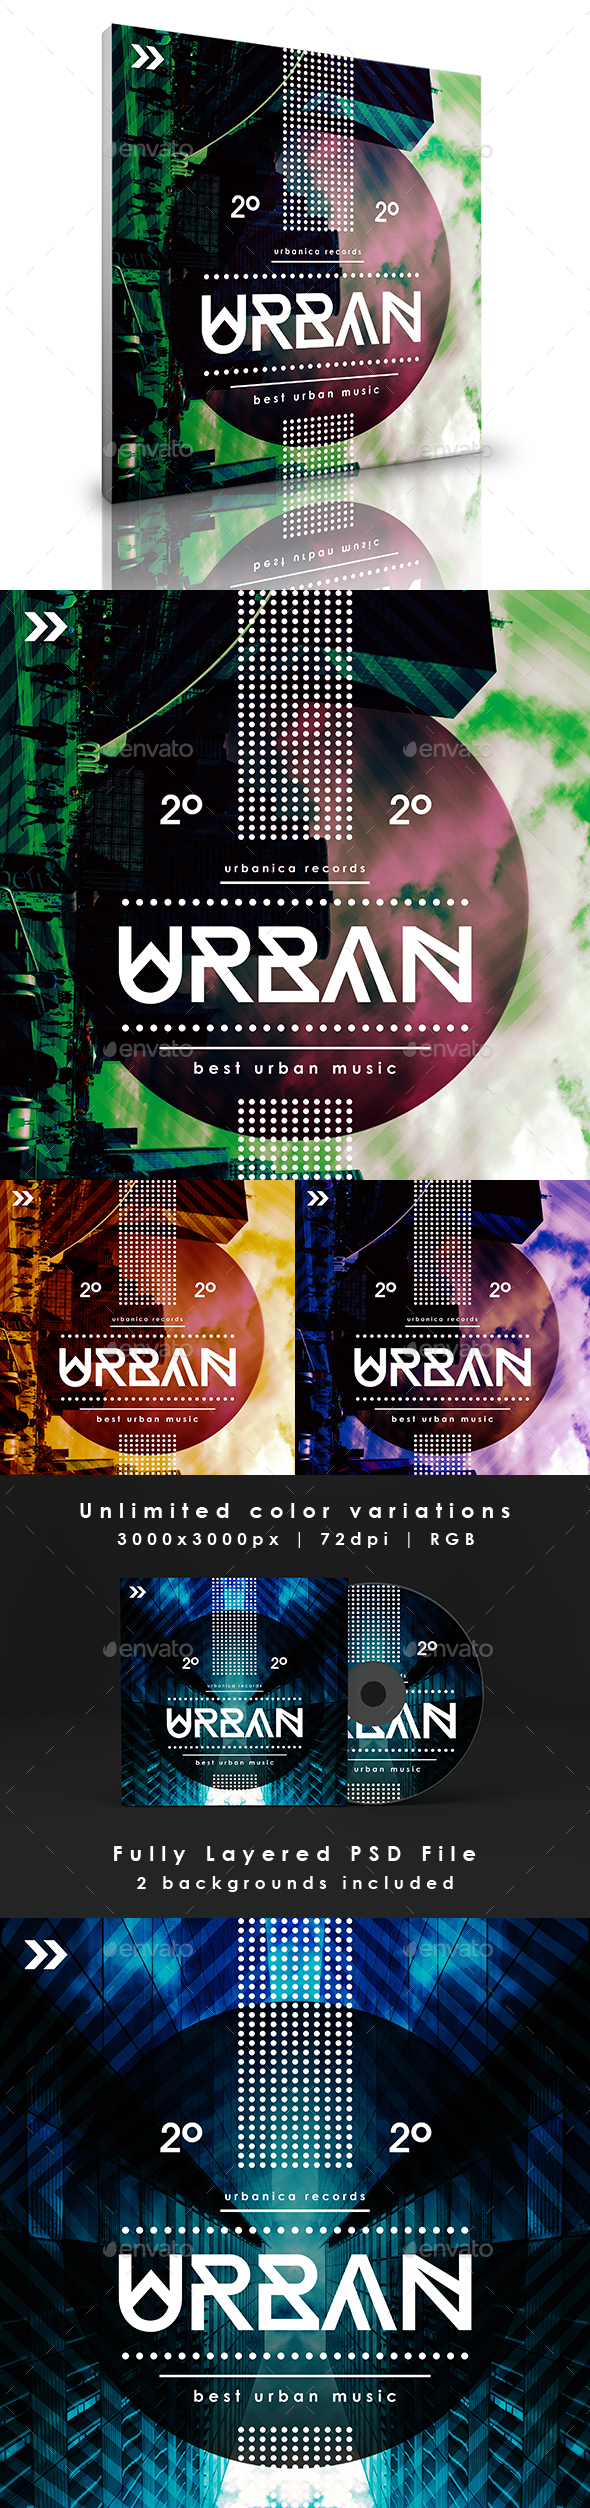 Urban -  Abstract Music Album Cover Artwork Template